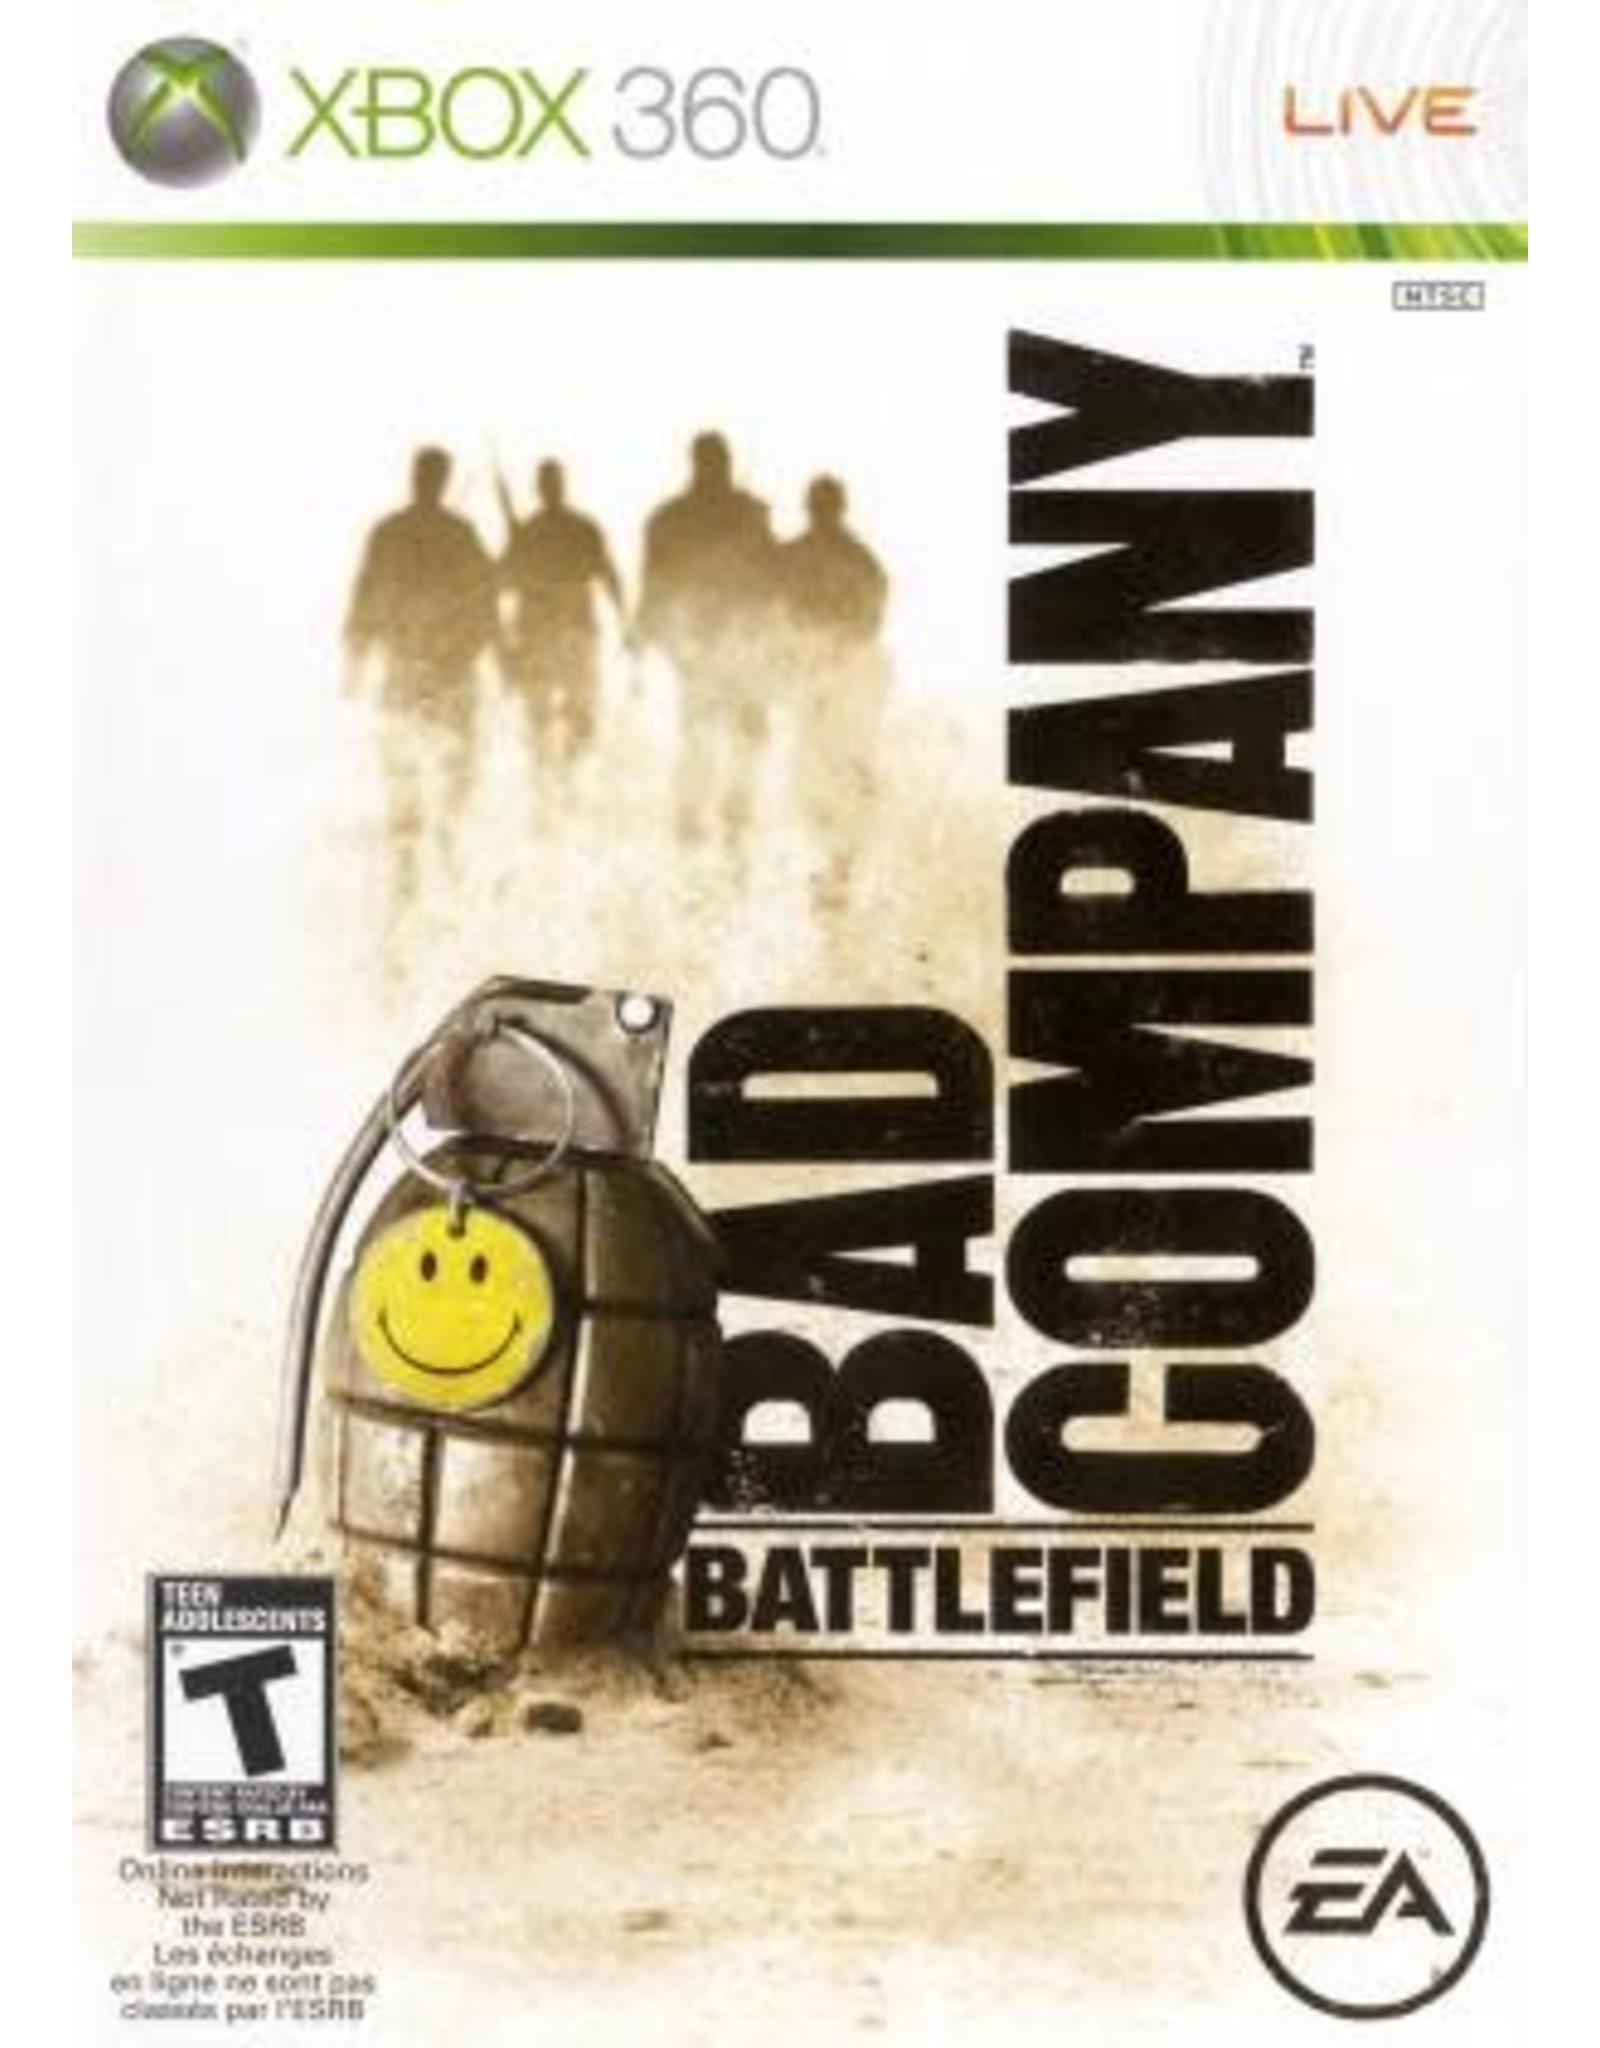 Xbox 360 Battlefield Bad Company (CiB)